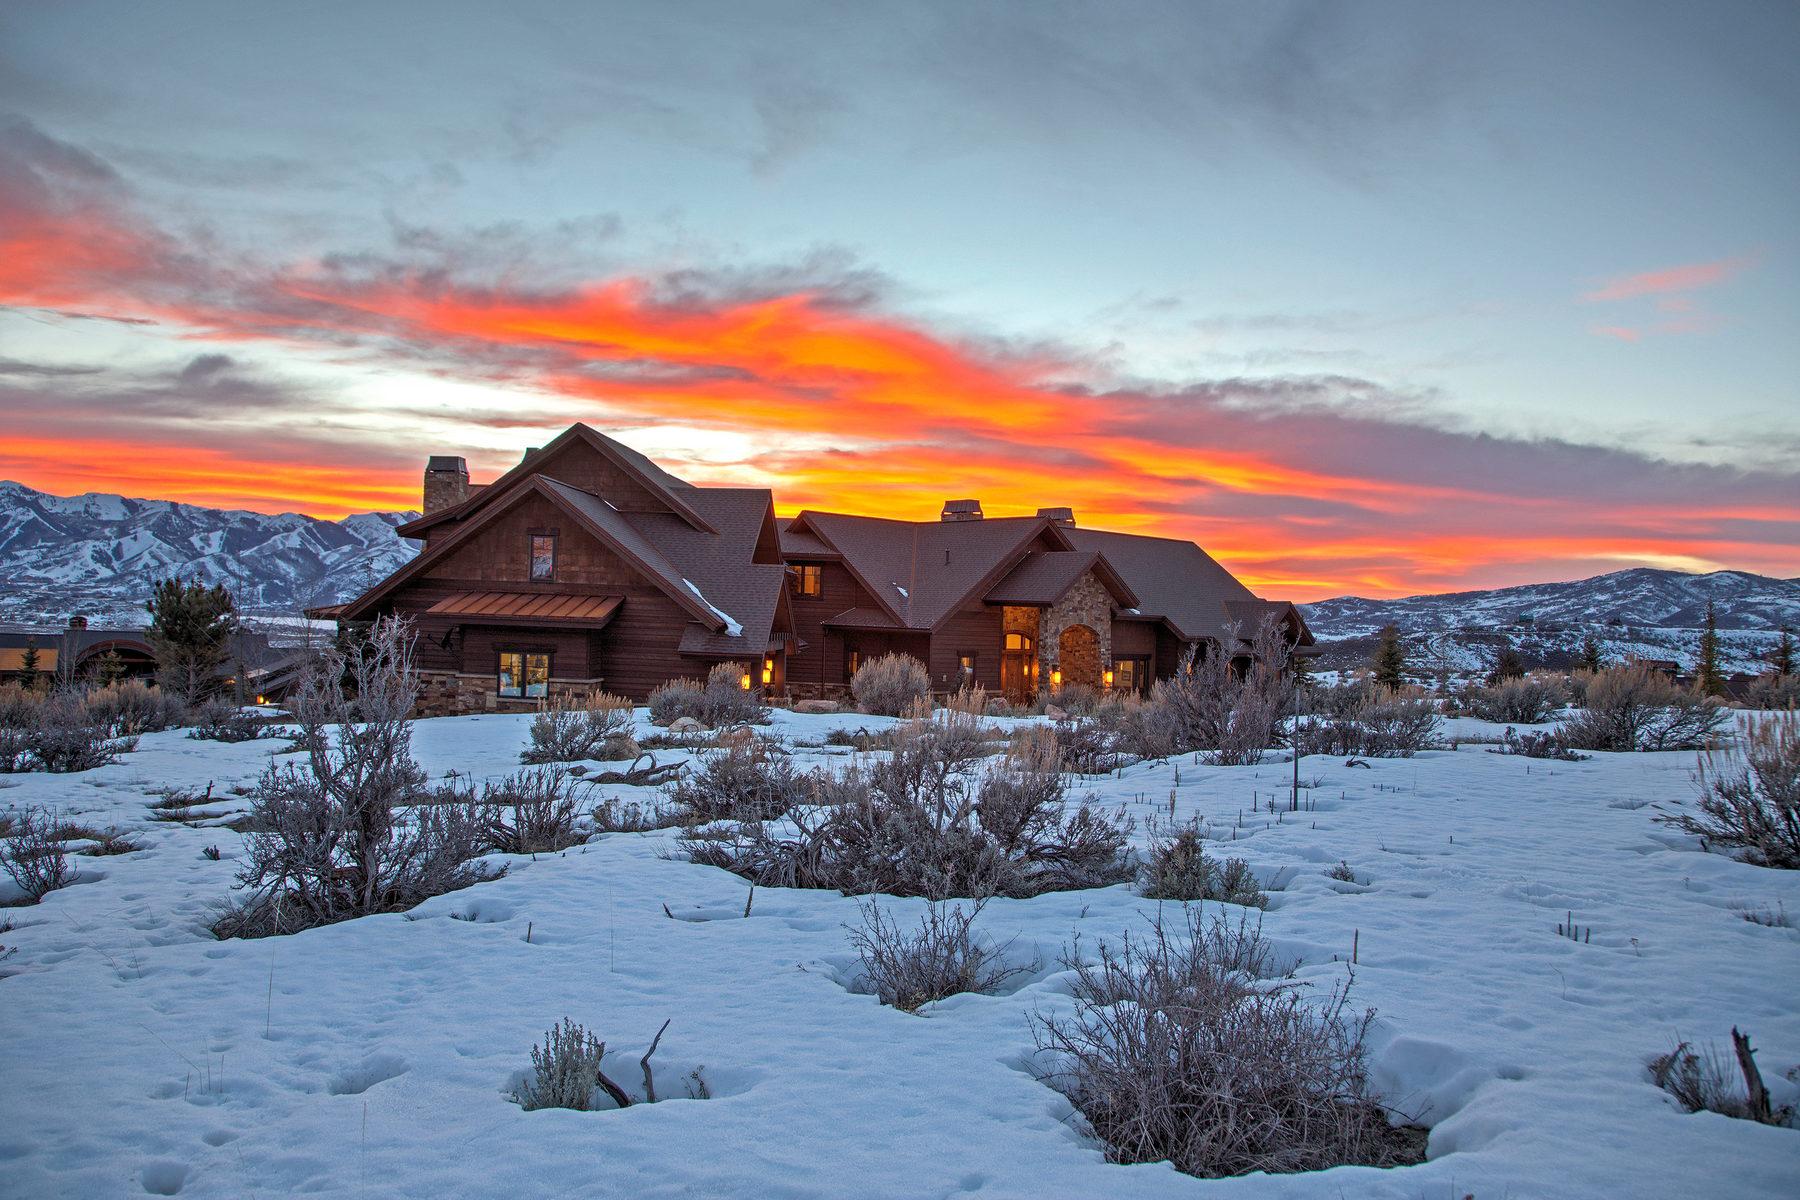 独户住宅 为 销售 在 Impeccable Living in Promontory with Expansive Ski Mountain Views 2624 E Cliff Rose Ct 帕克城, 犹他州, 84098 美国